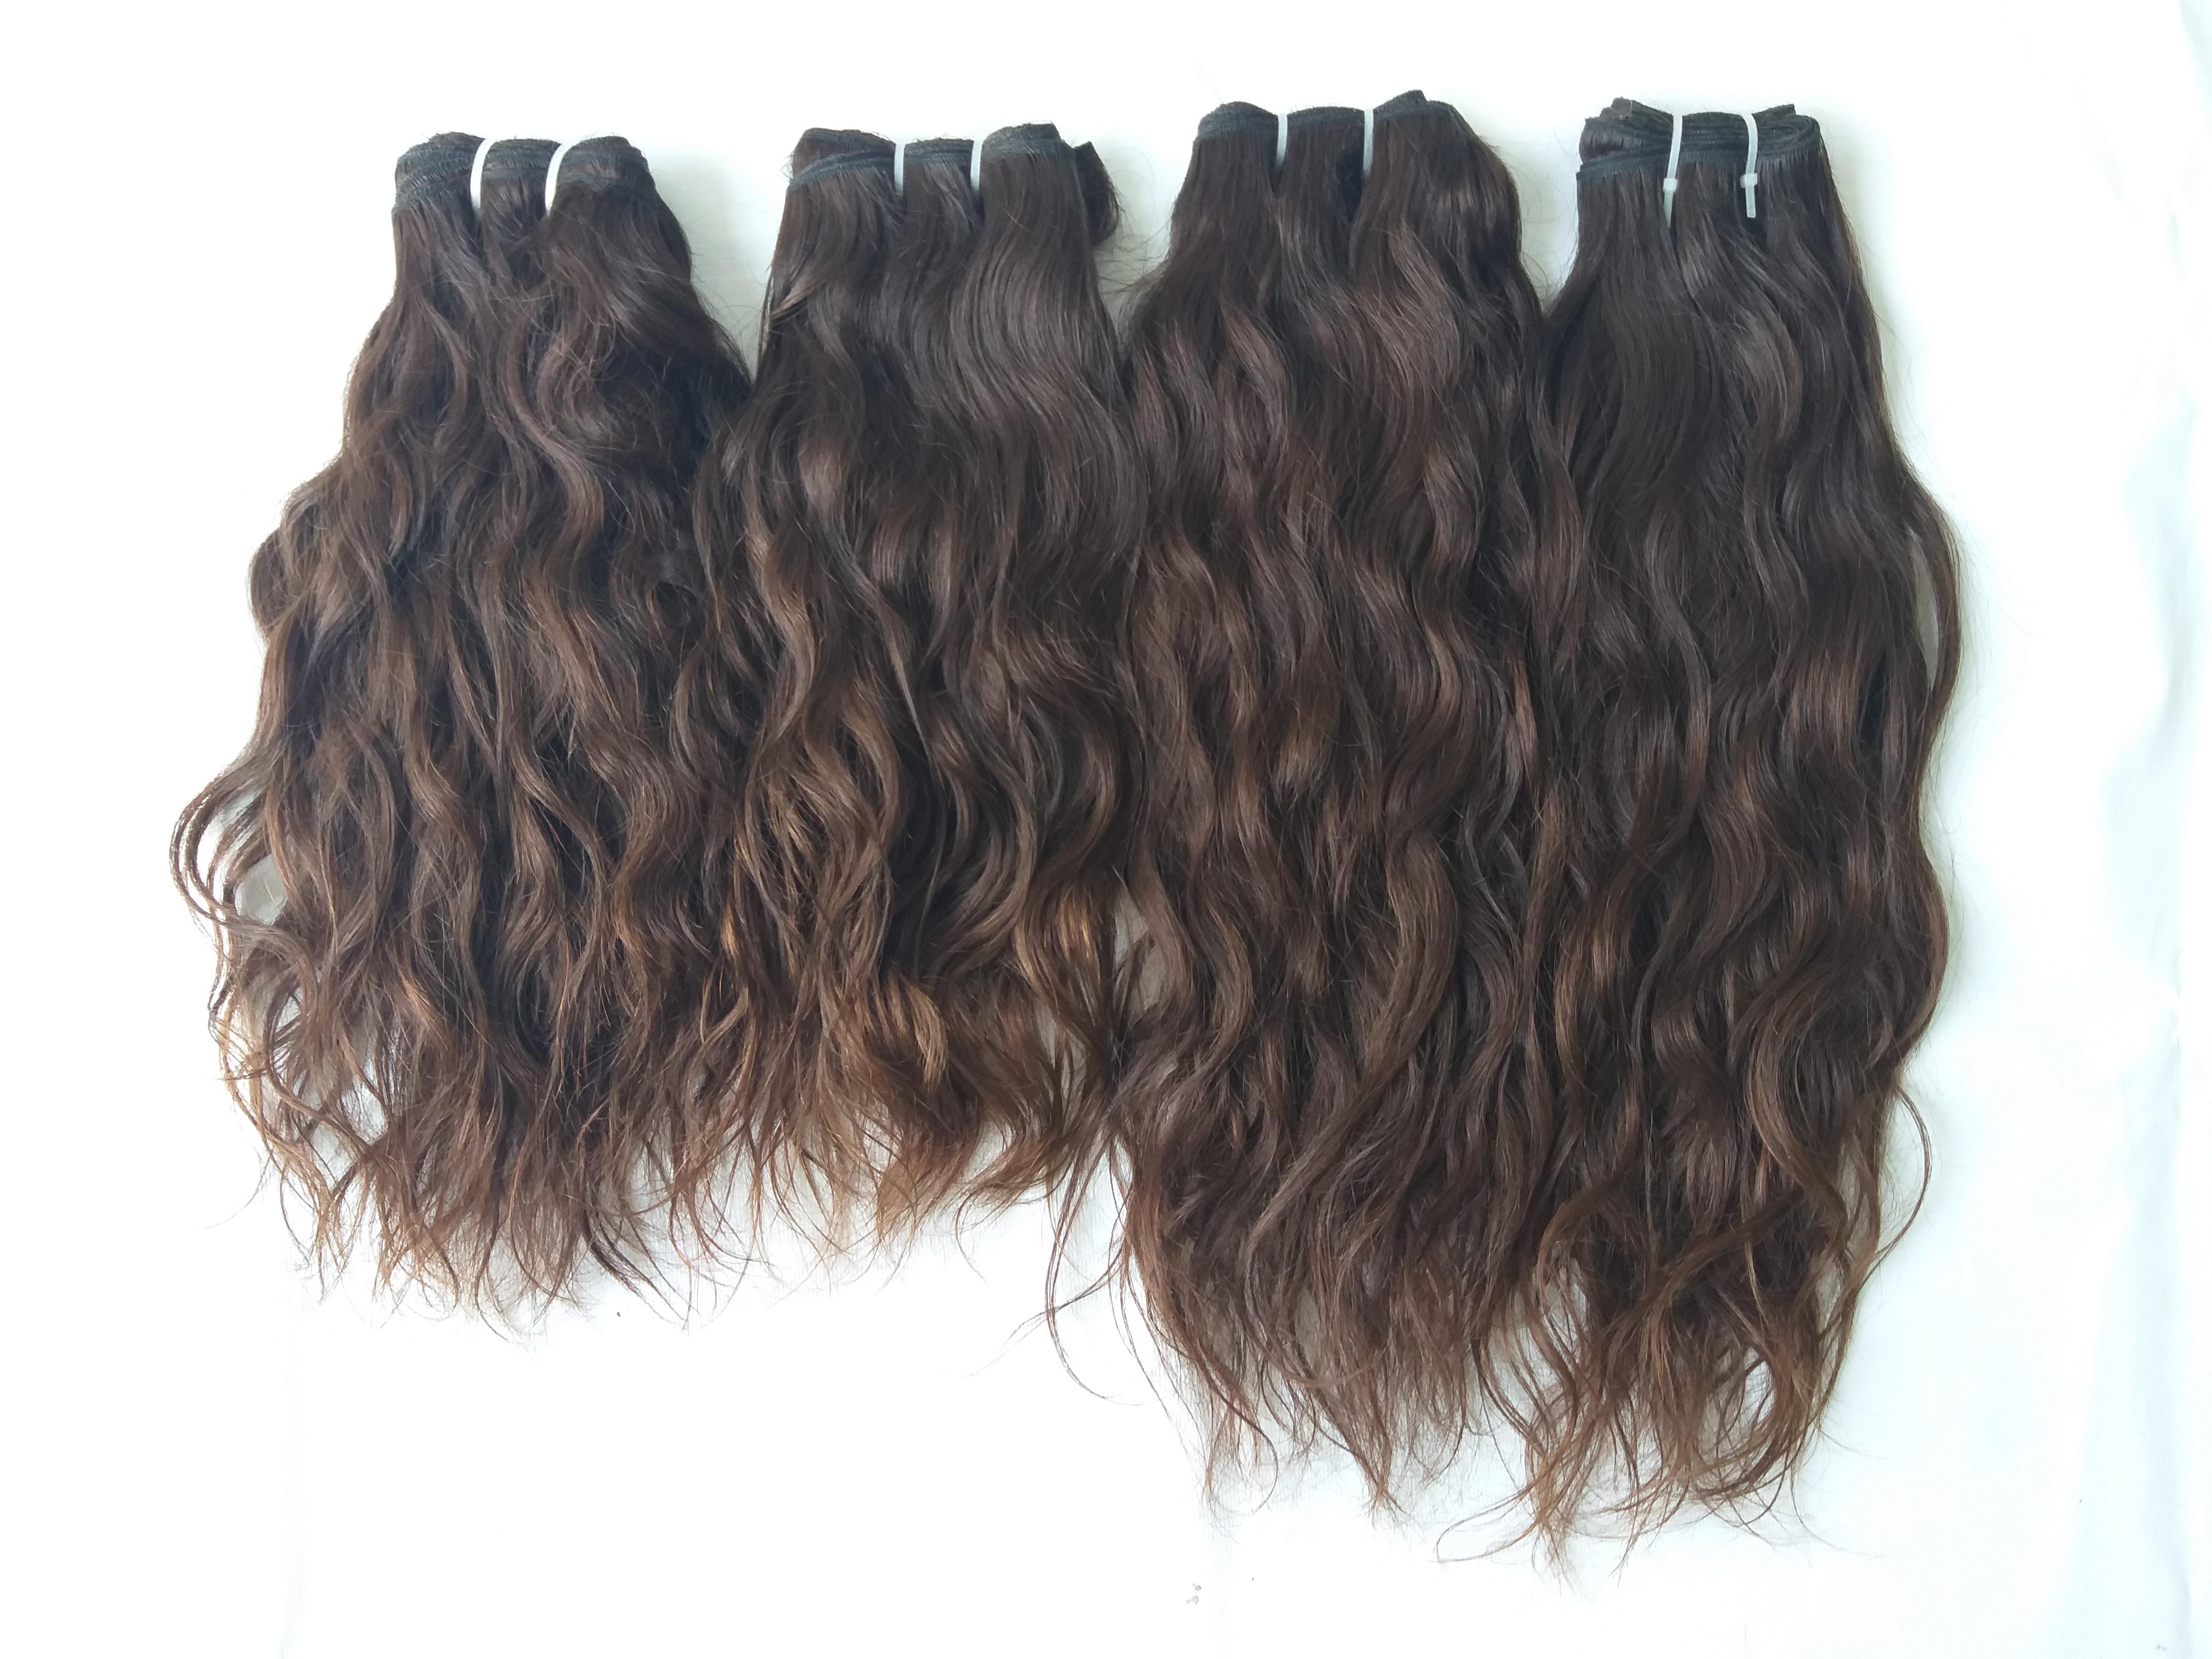 Vintage Wavy Human Hair Extensions